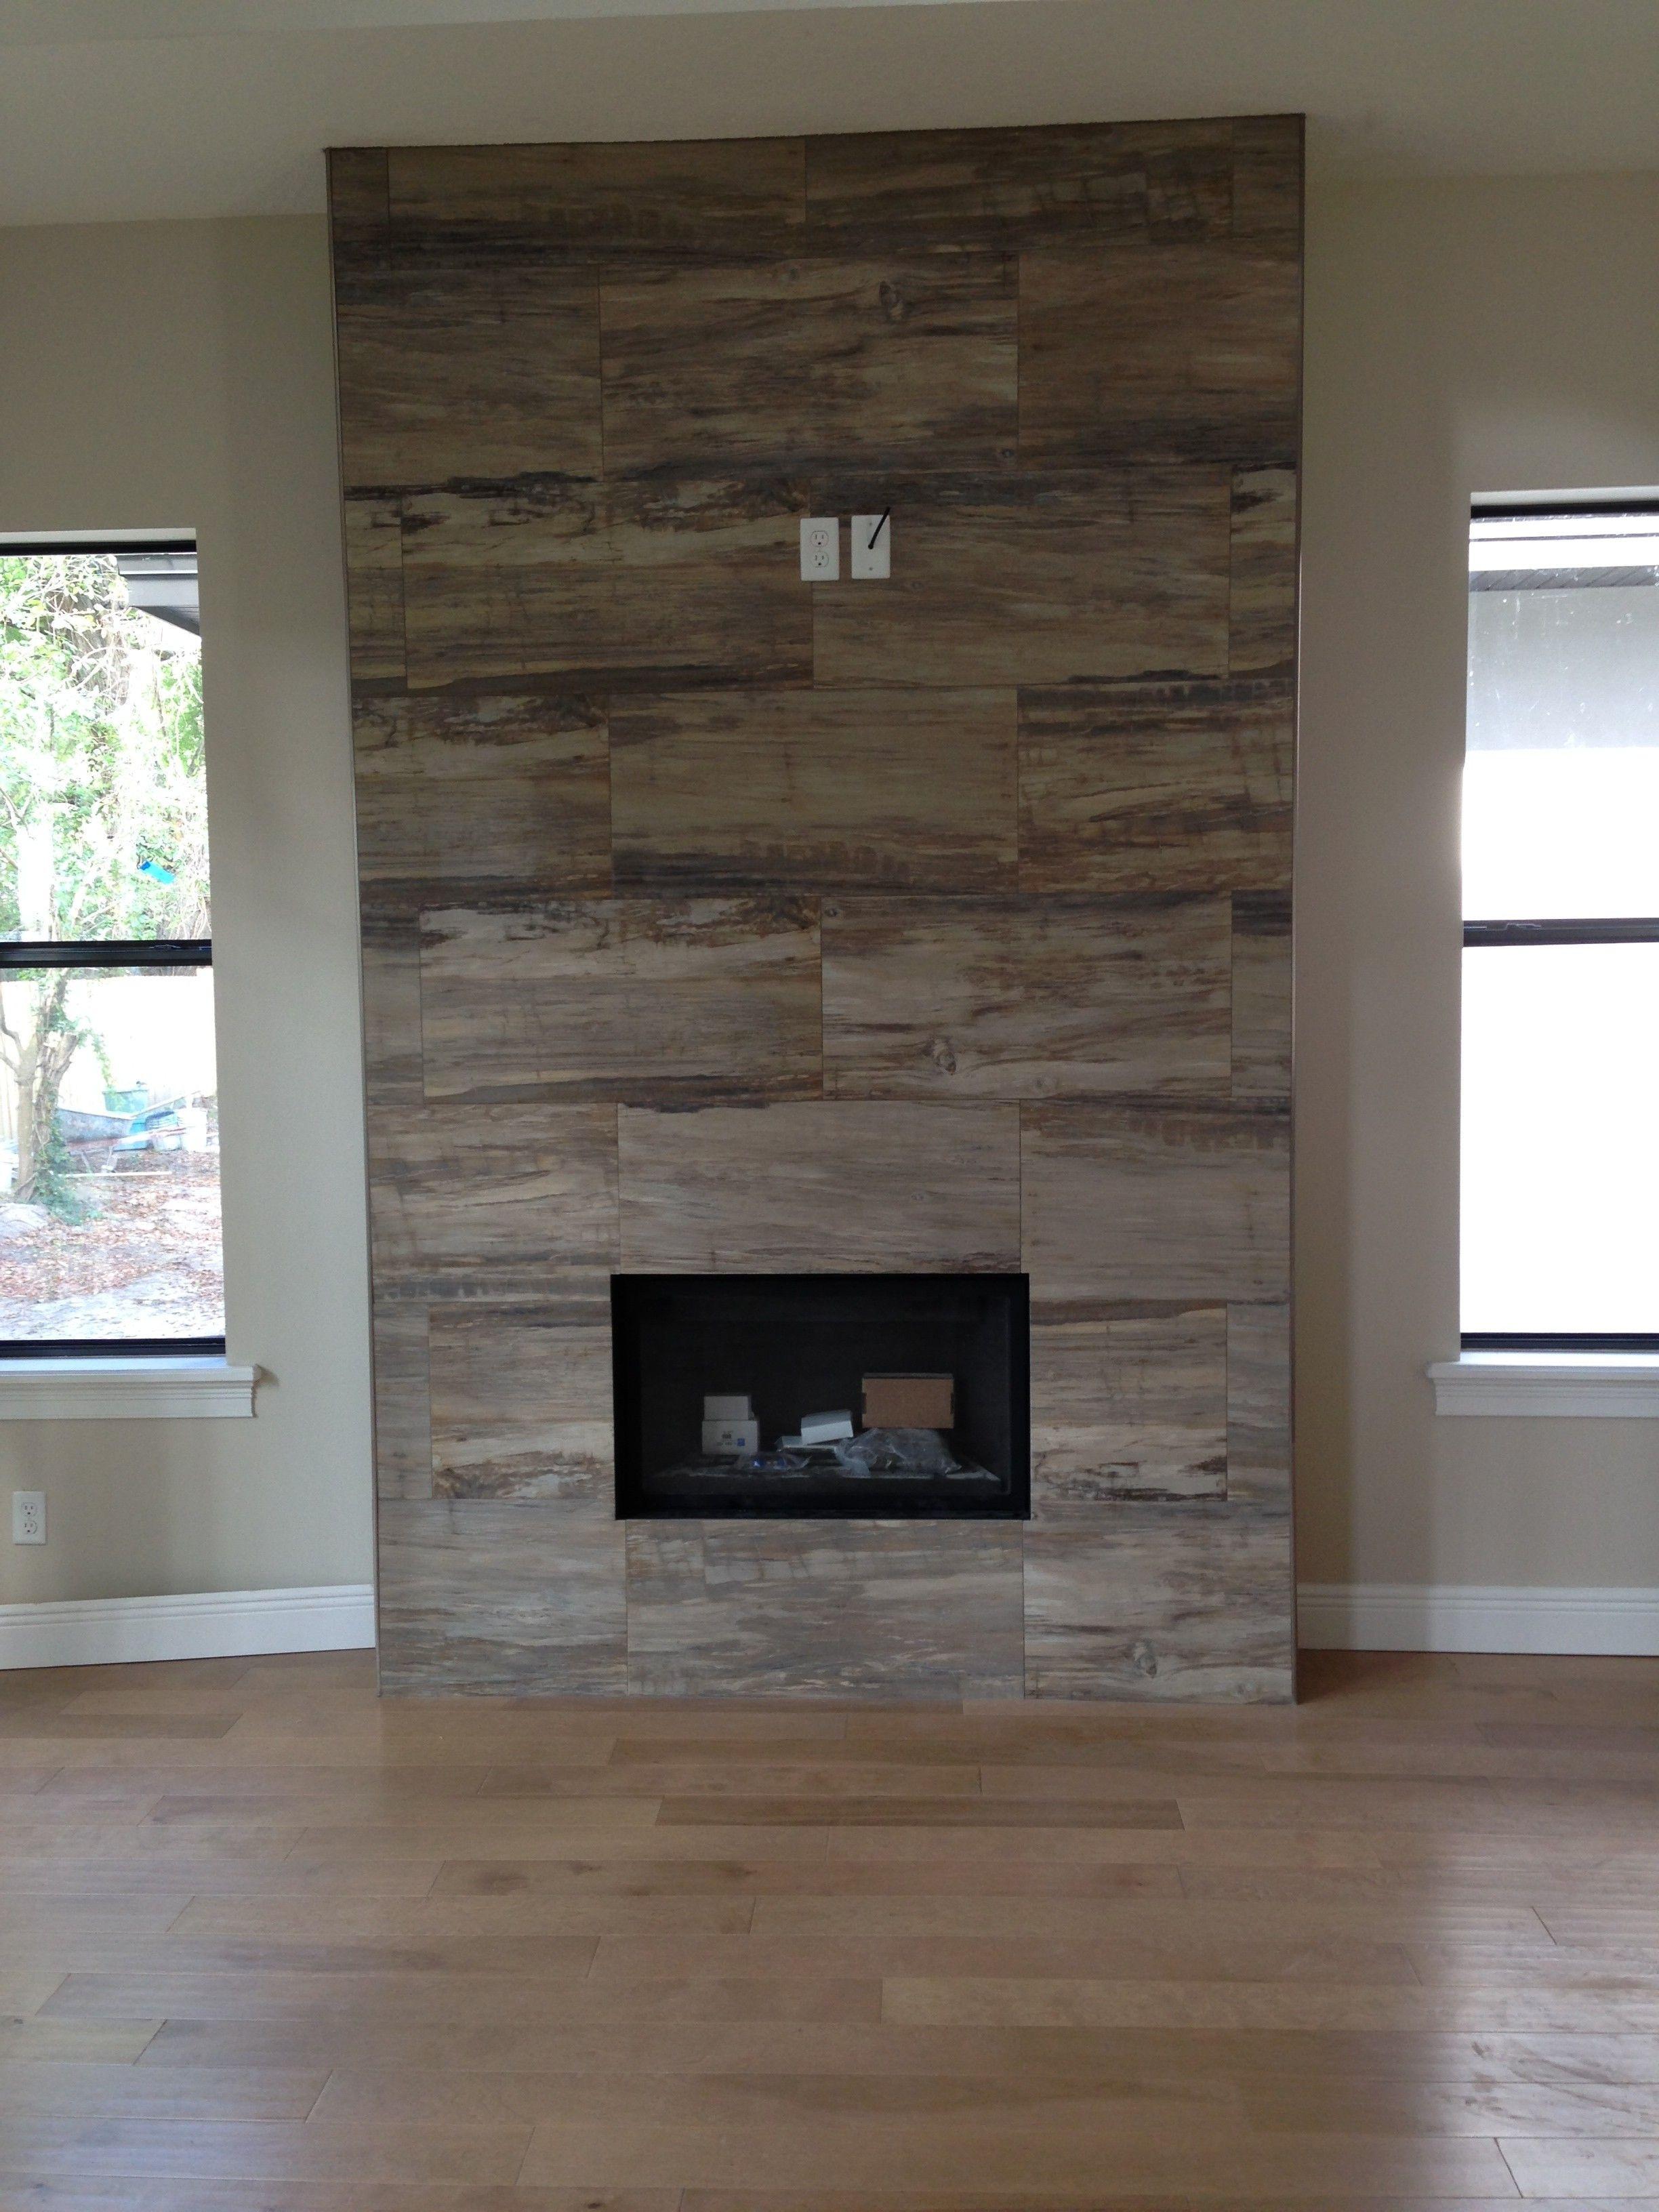 hardwood floors around brick fireplace hearths of j wood tile makes an absolutely stunning fireplace inspiration with j wood tile makes an absolutely stunning fireplace